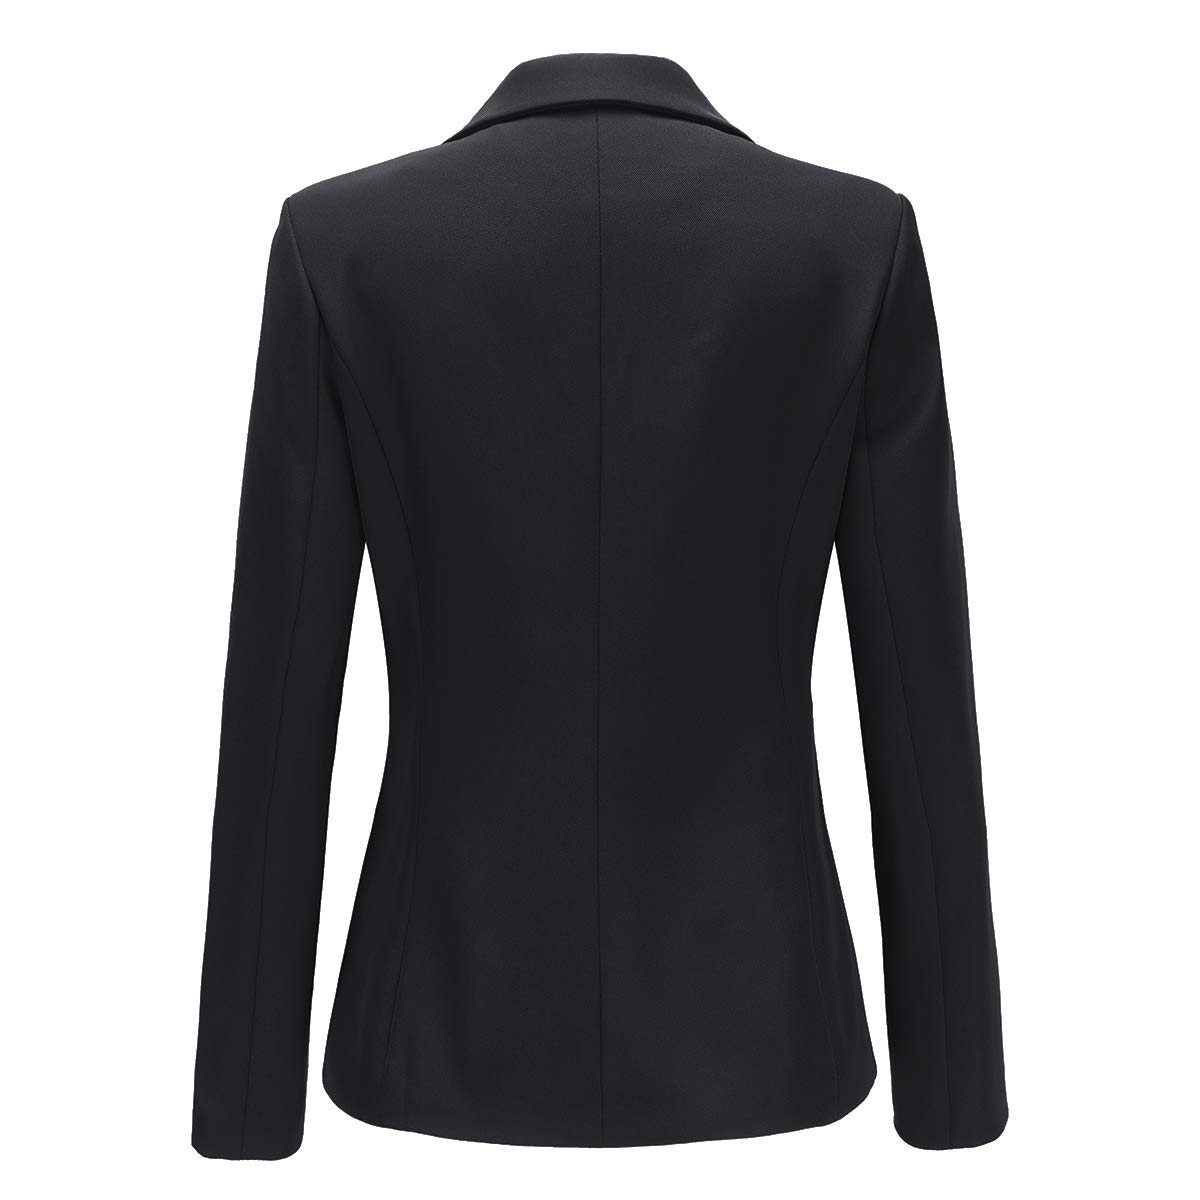 Giacca da Donna a Maniche Lunghe vestibilit/à Aderente Stile Casual e Formale Elegante YYNUDA